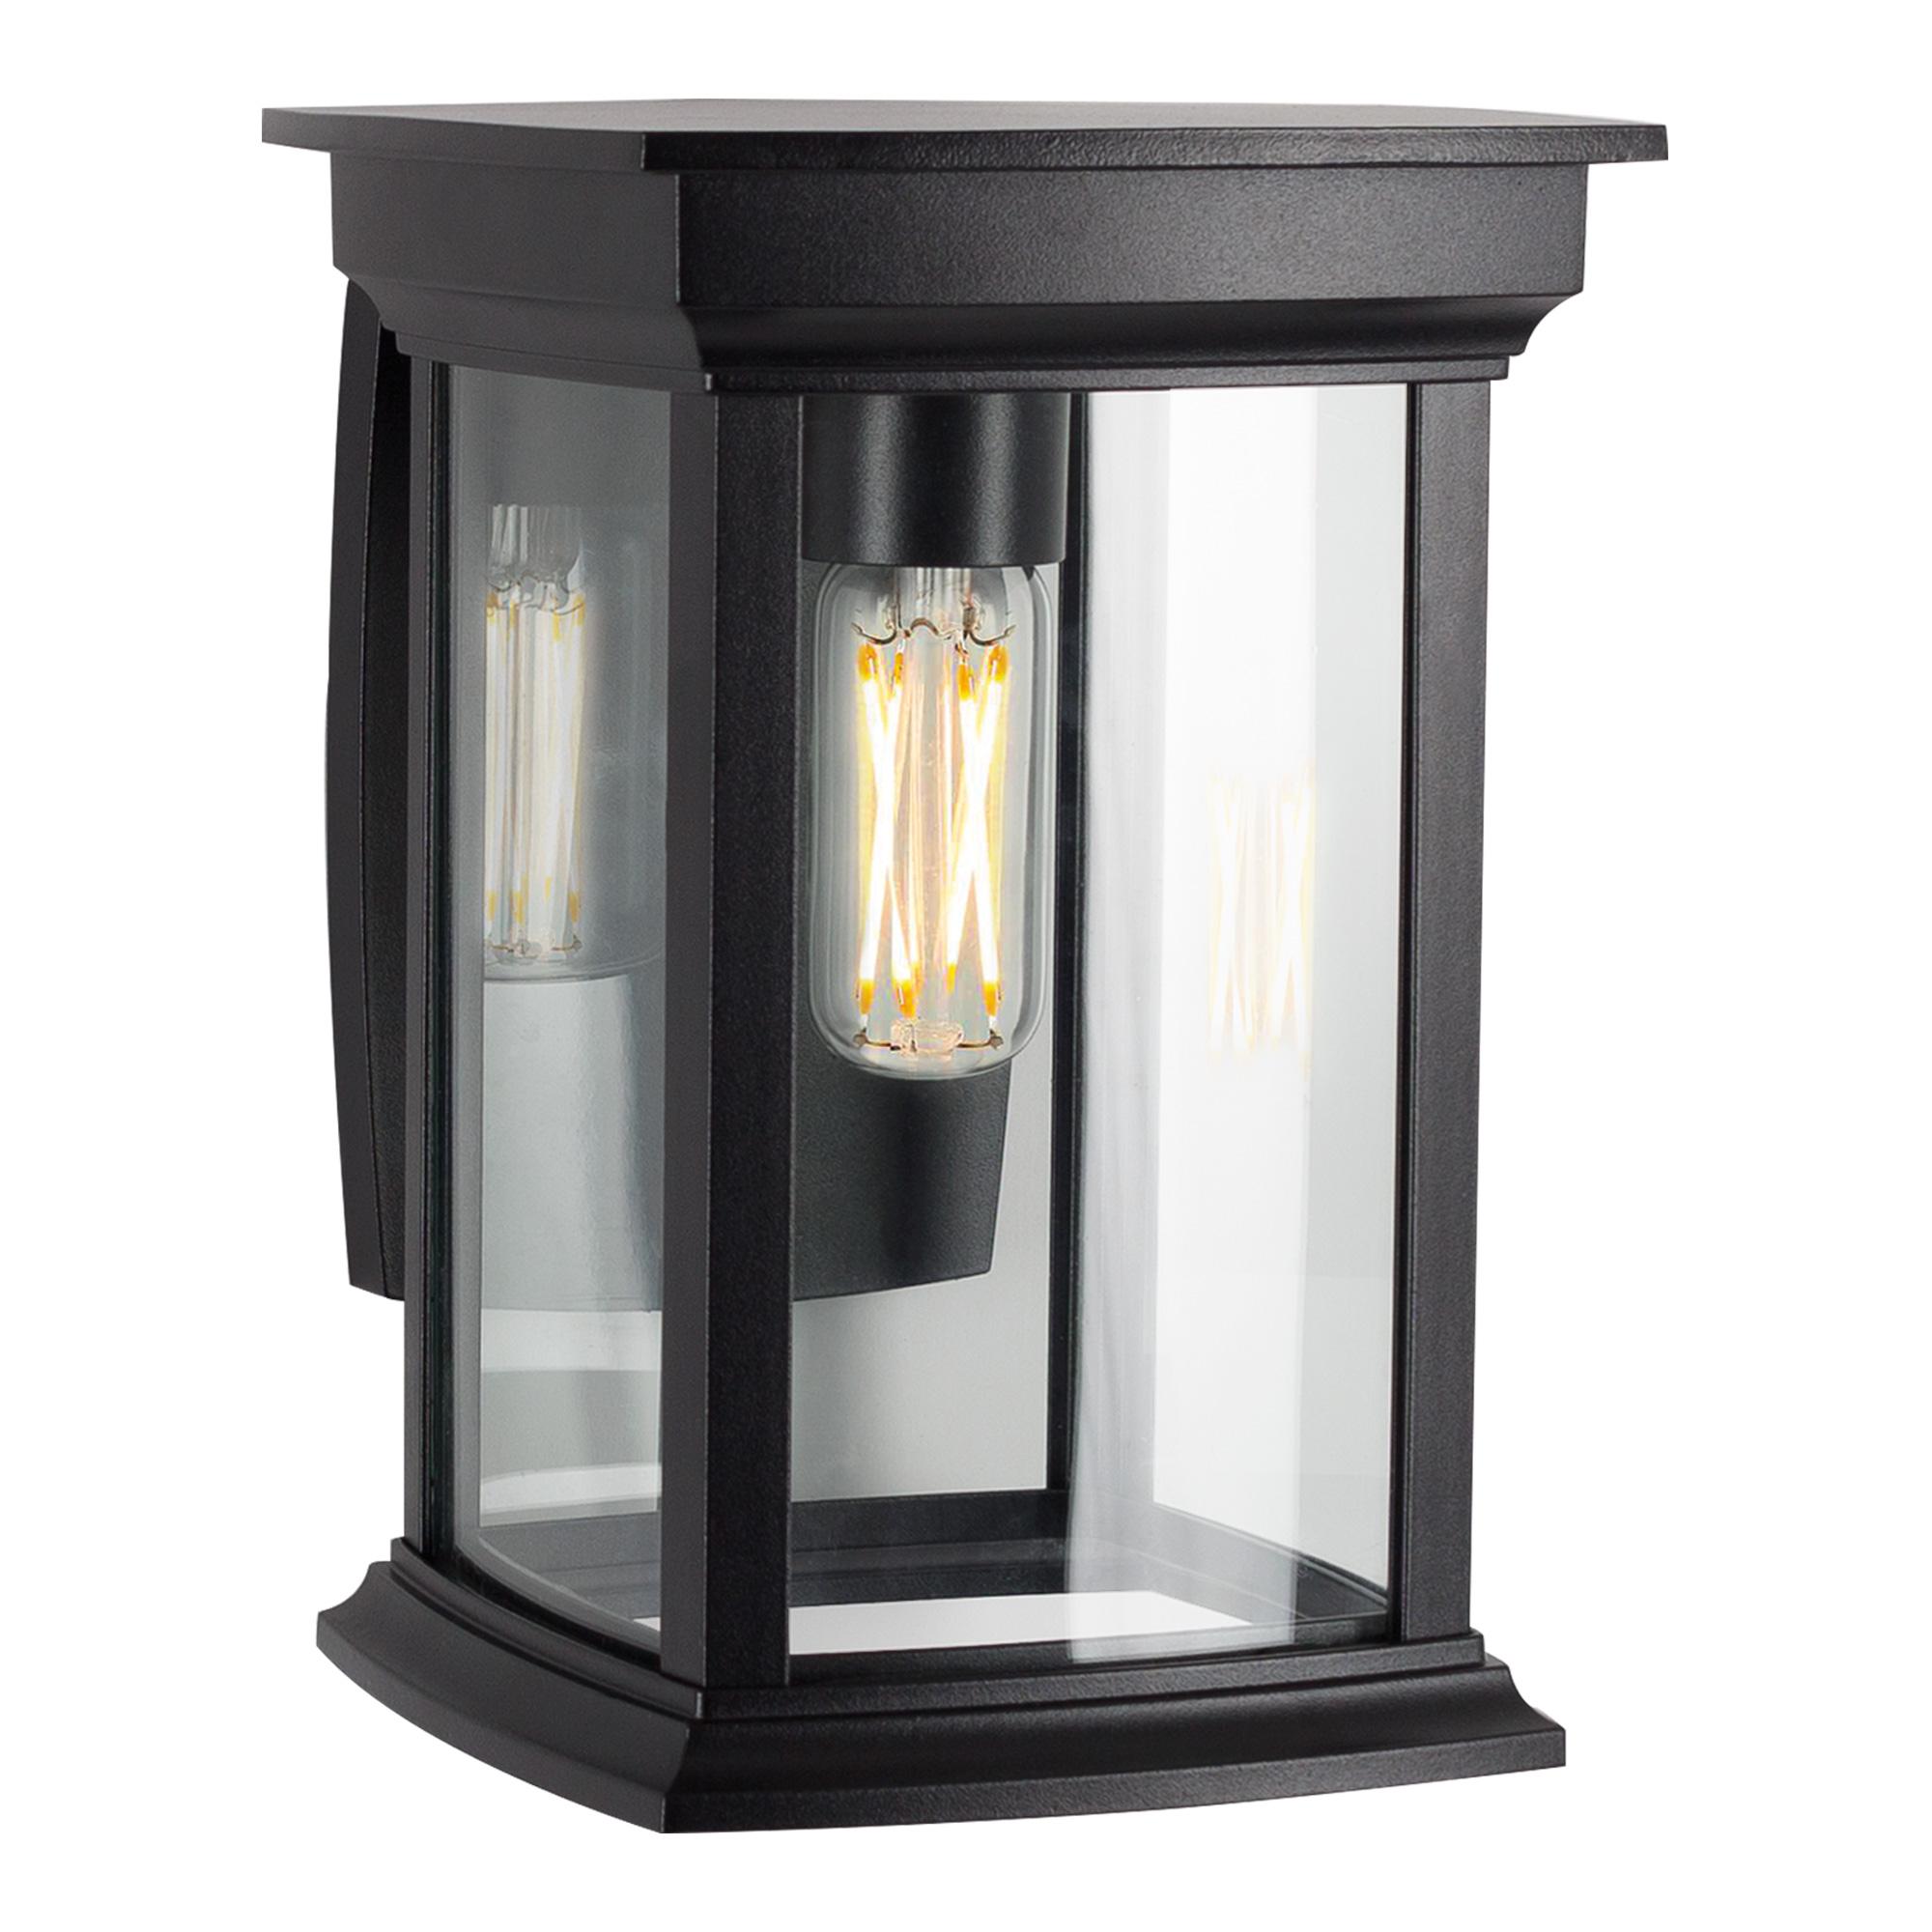 Buitenlamp Carlton Zwart